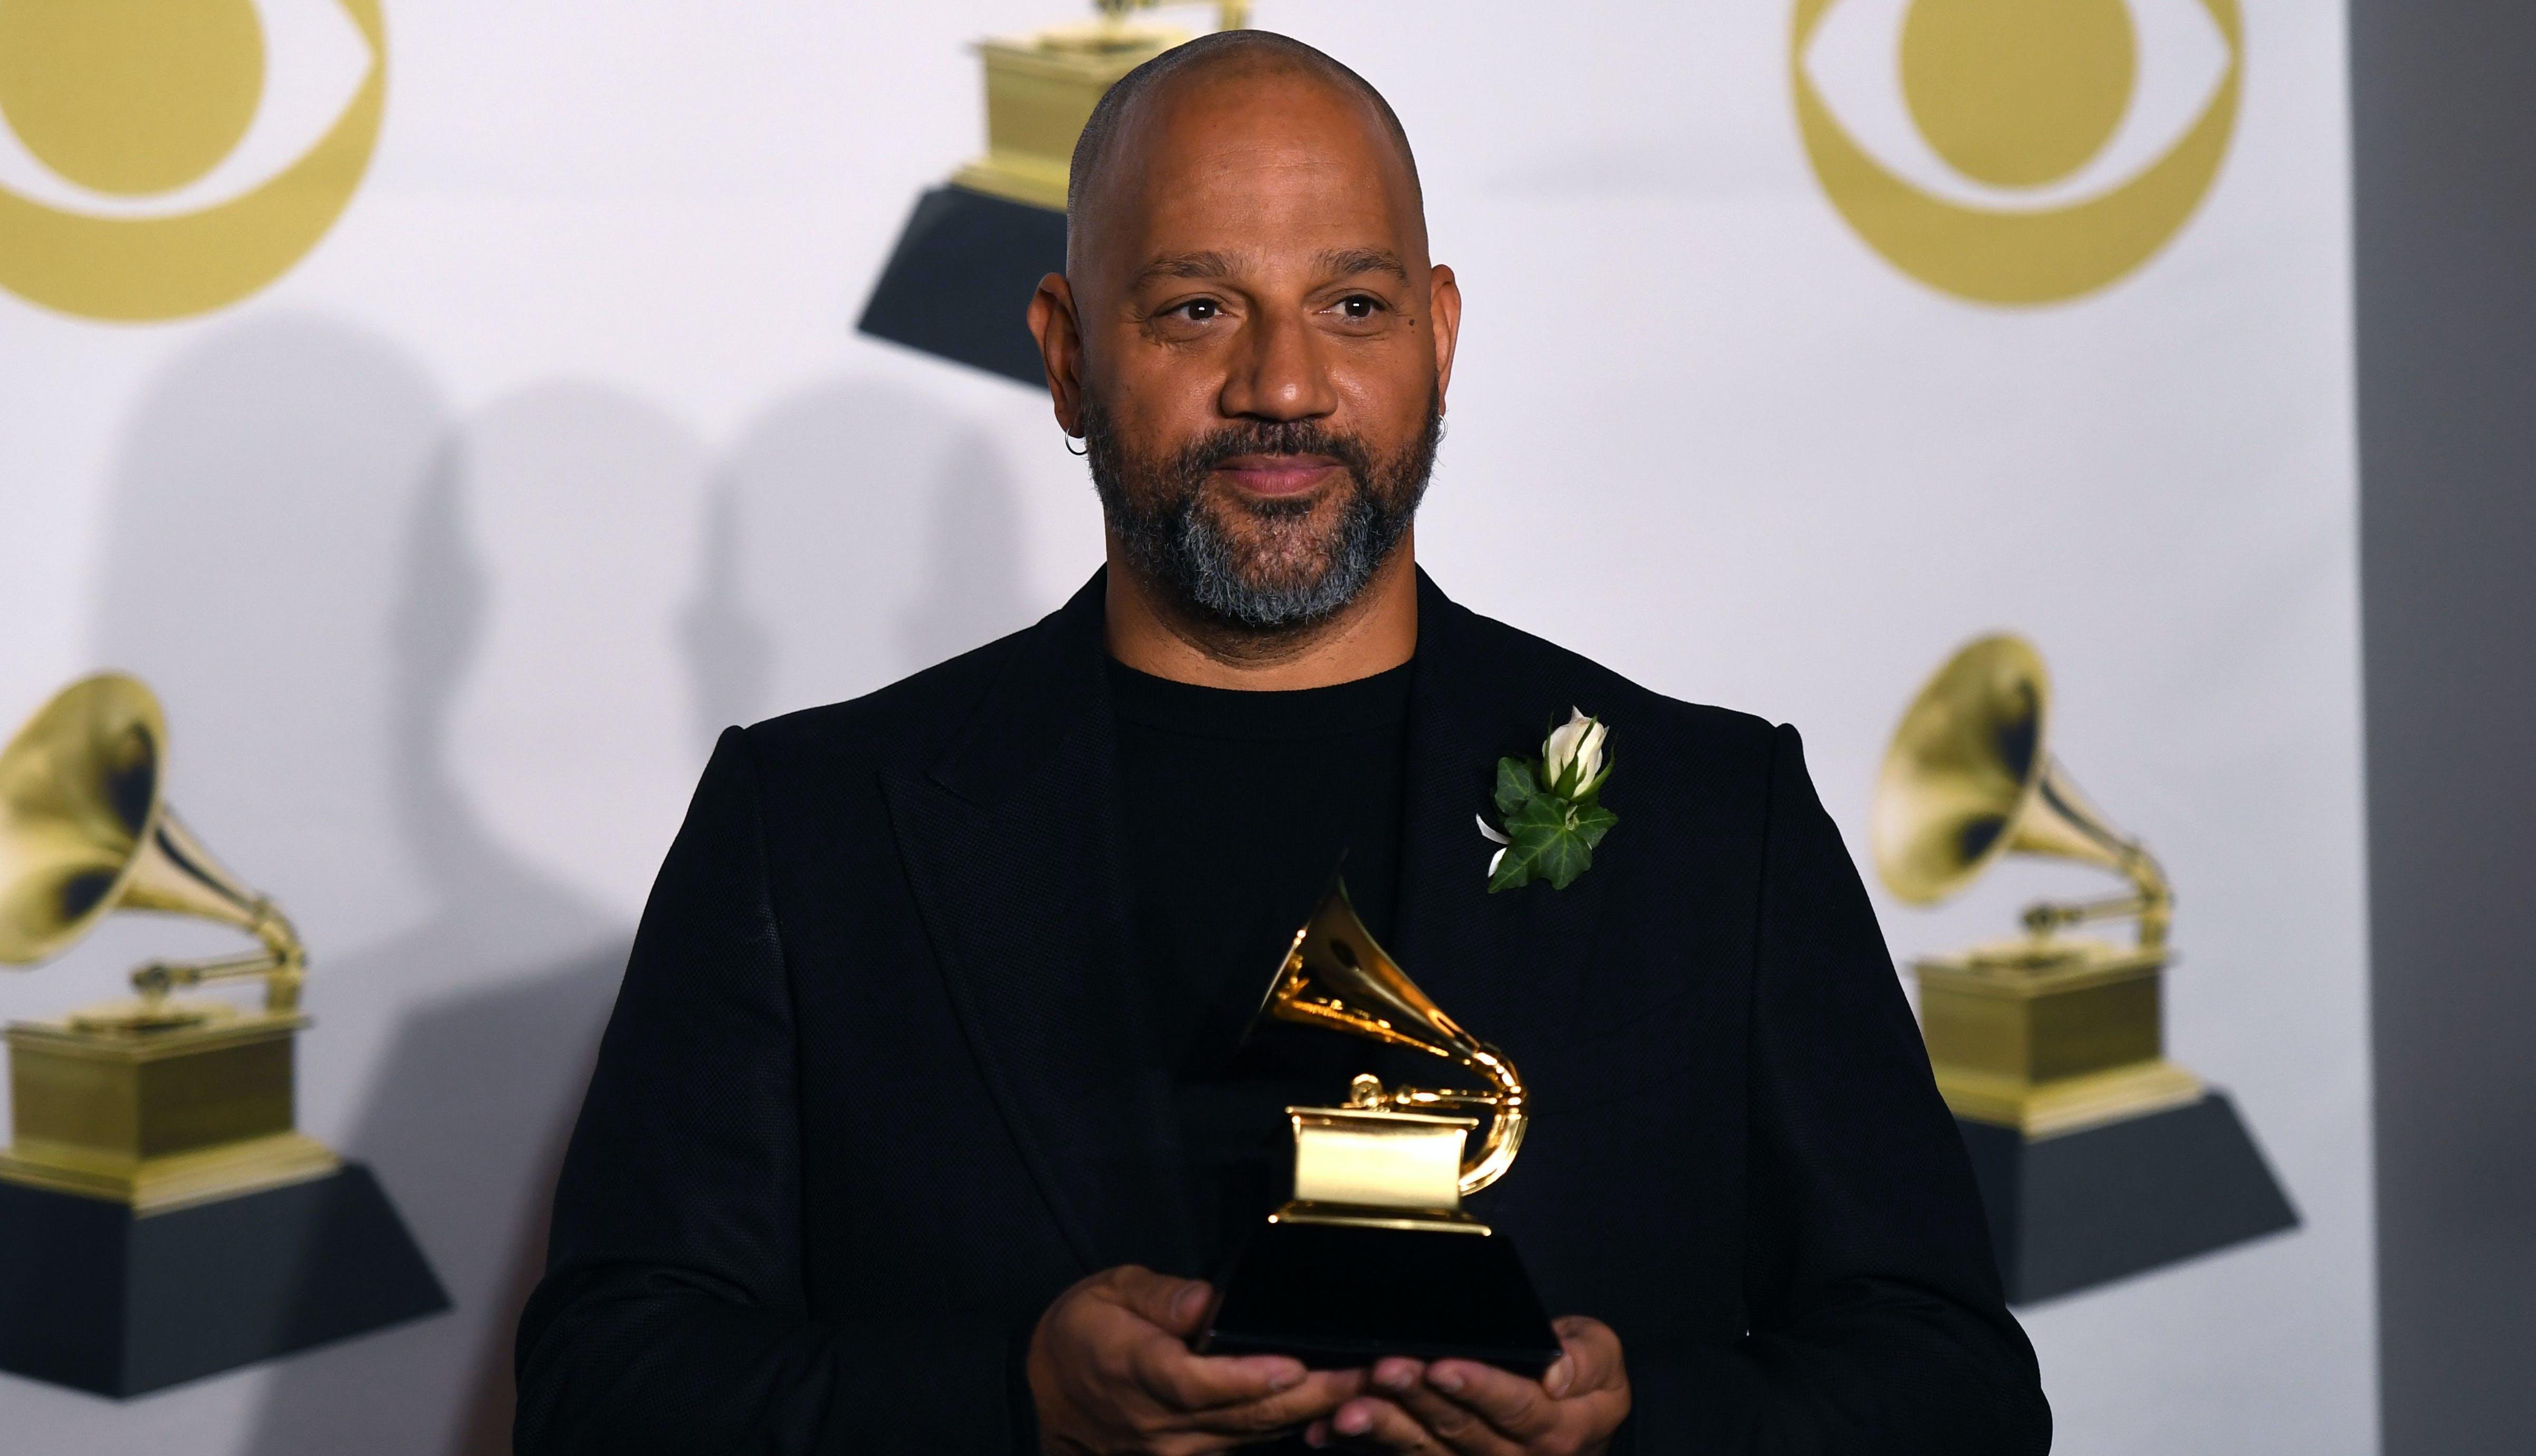 Grammy awards complete winners list